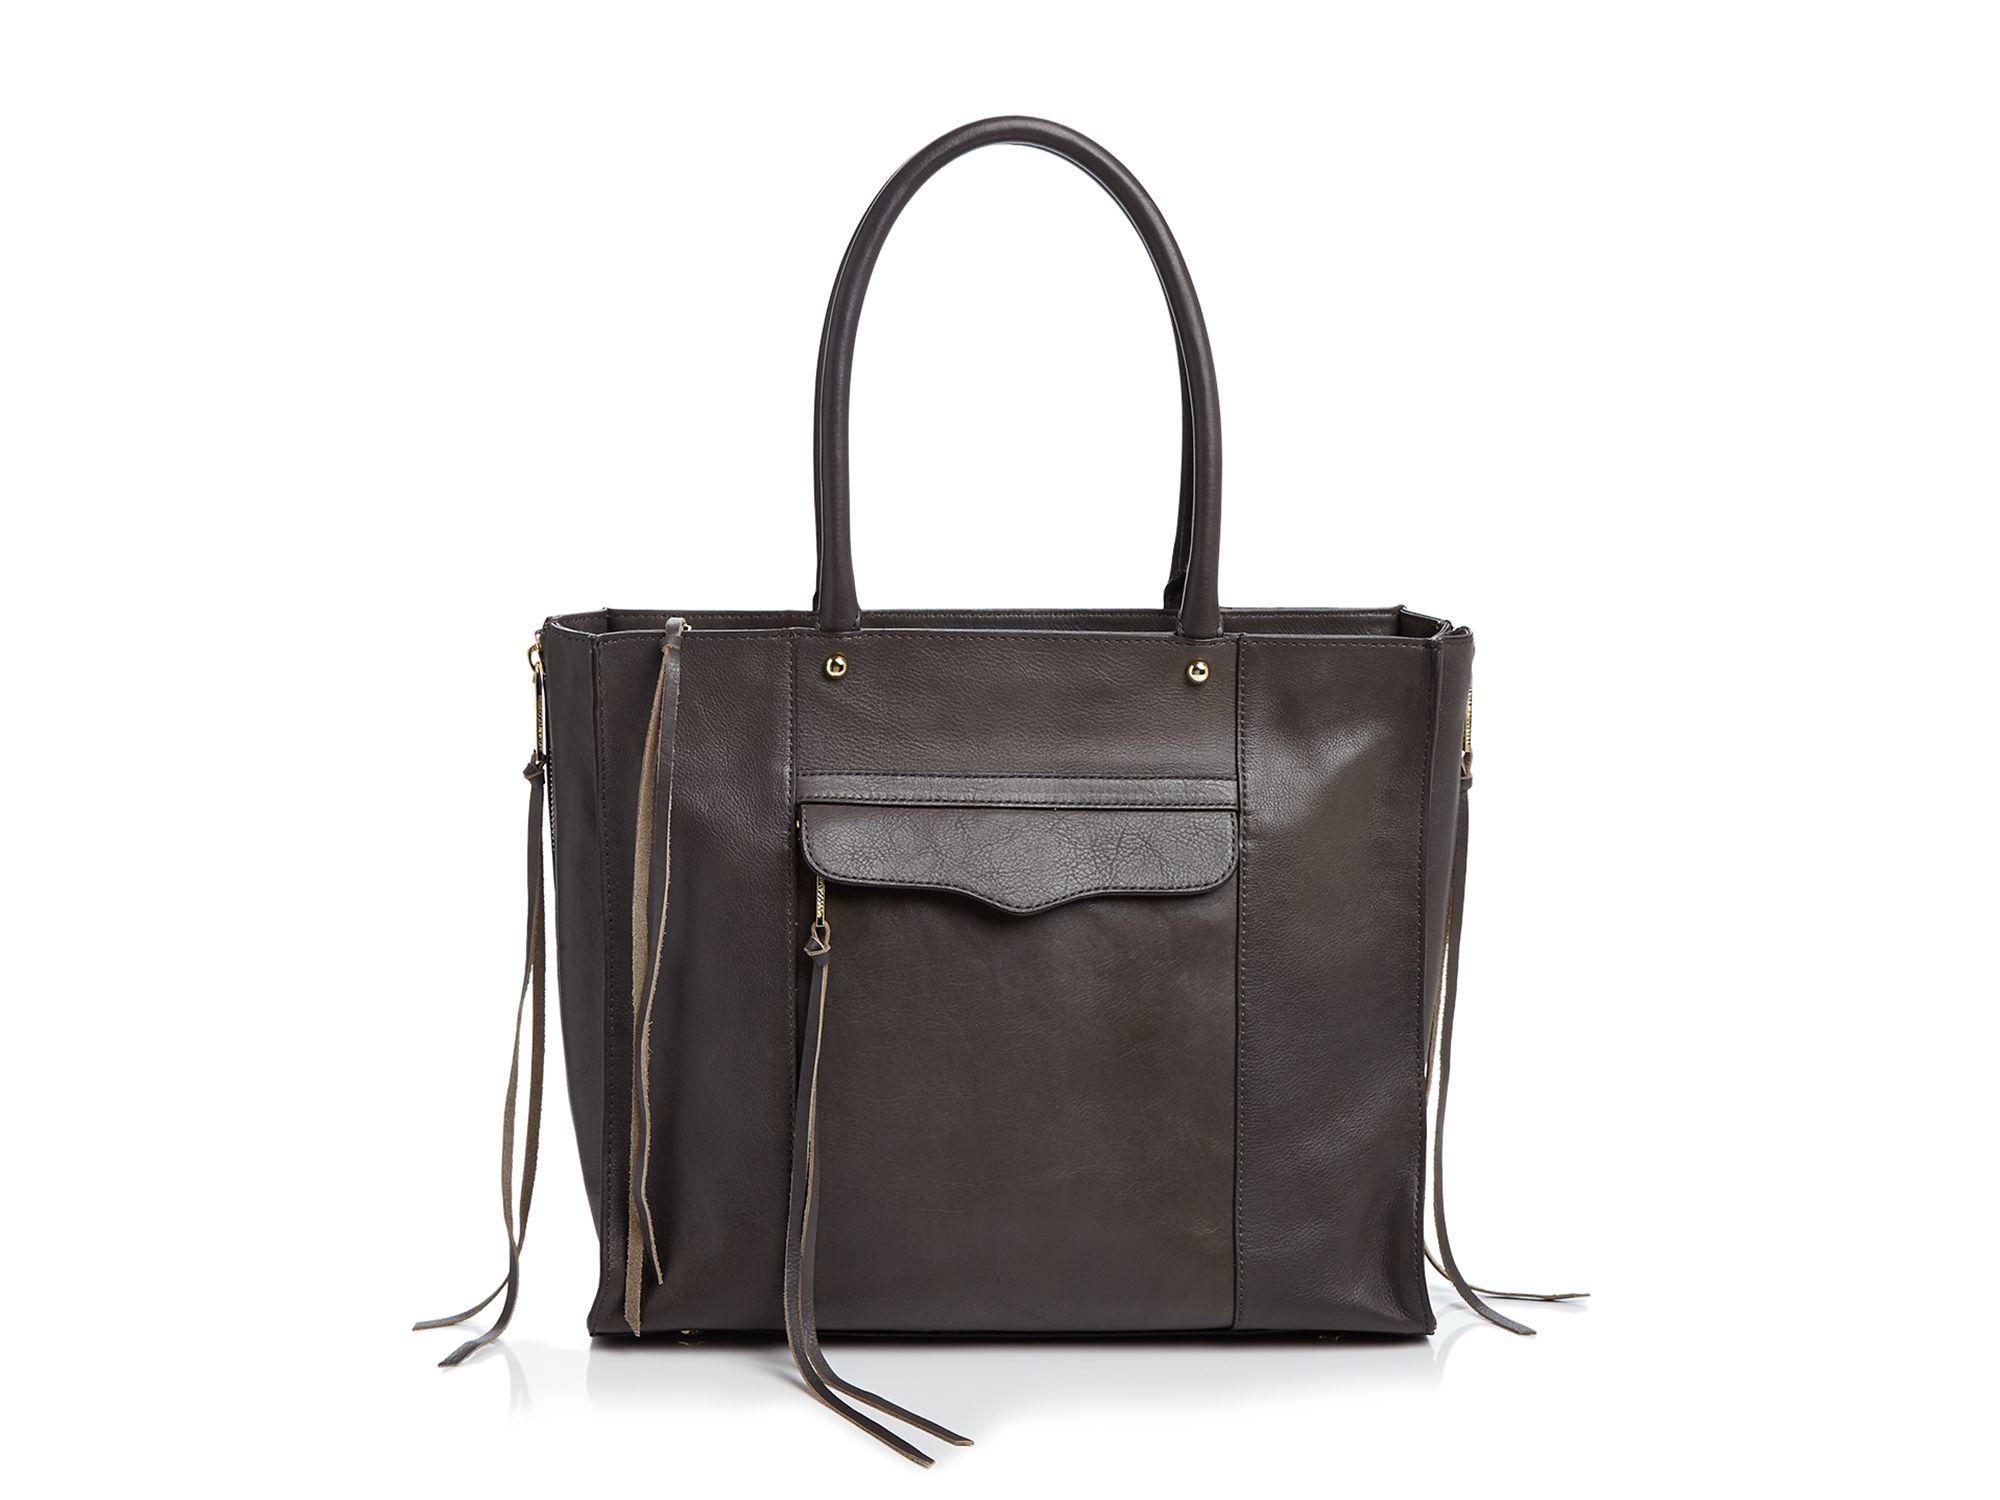 Rebecca Minkoff Leather Side Zip Medium Mab Tote In Gray